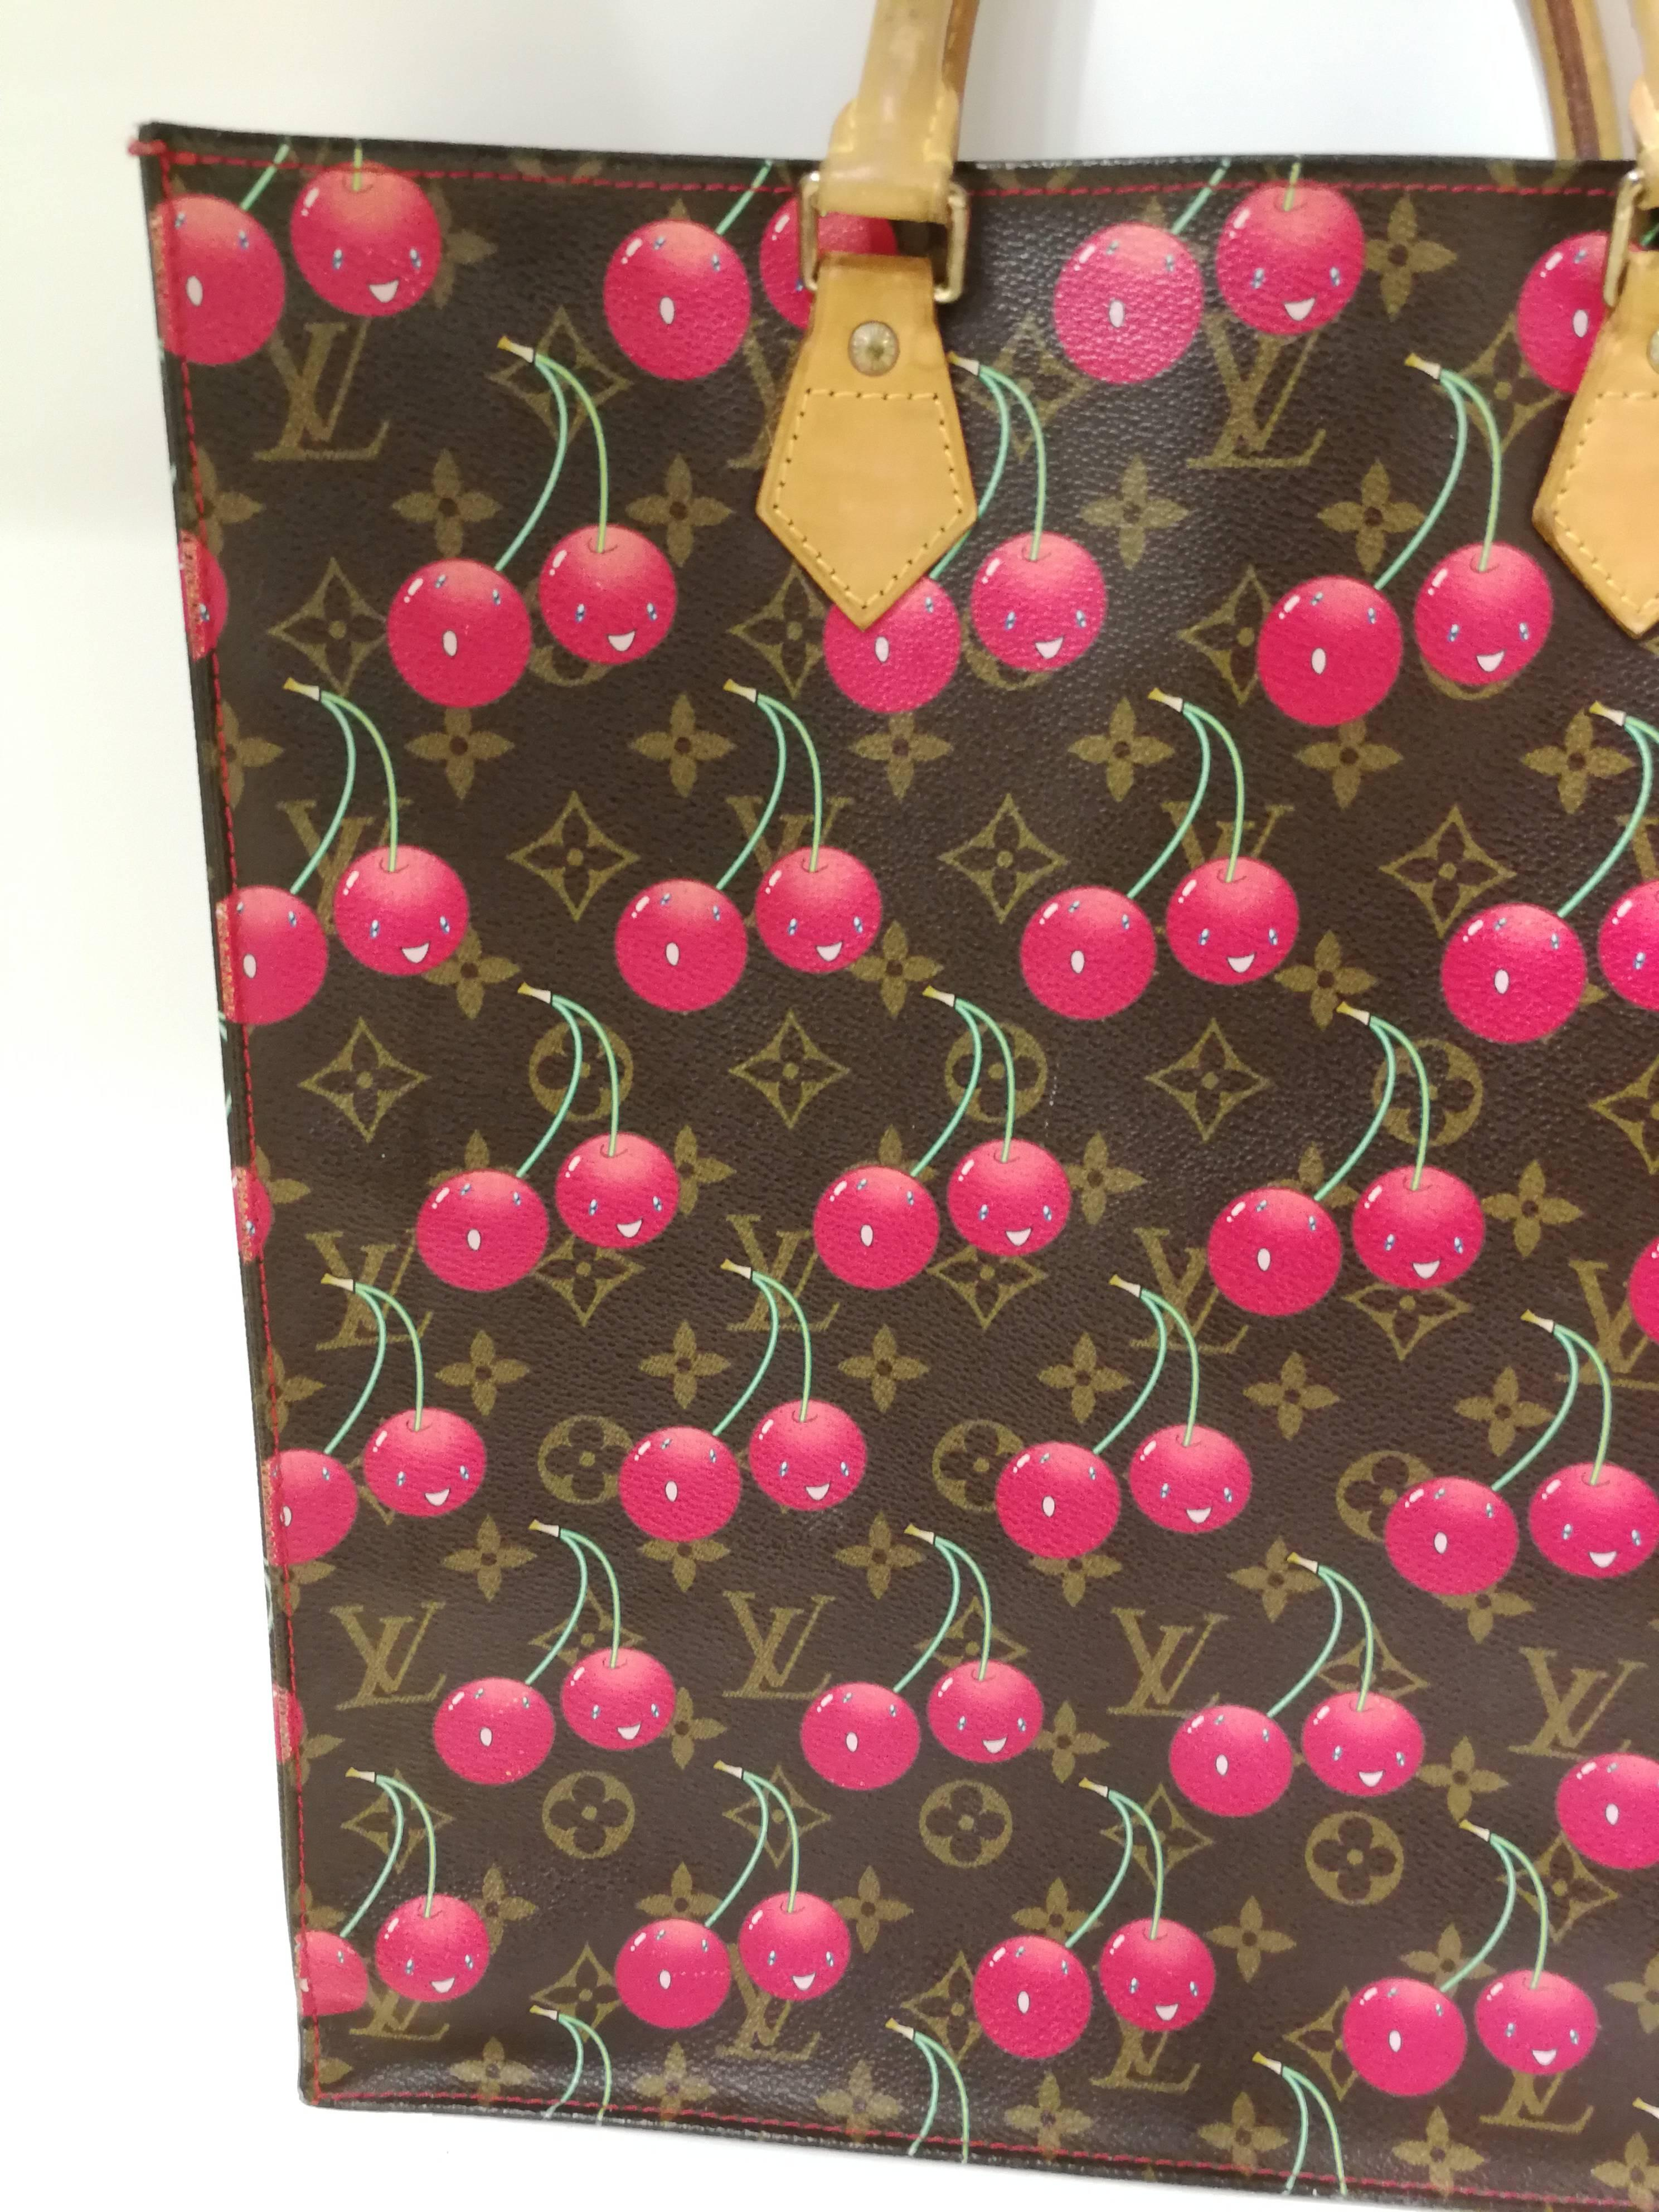 Louis Vuitton Murakami Sac Plat Cherry Bag at 1stdibs 2e7c225509088